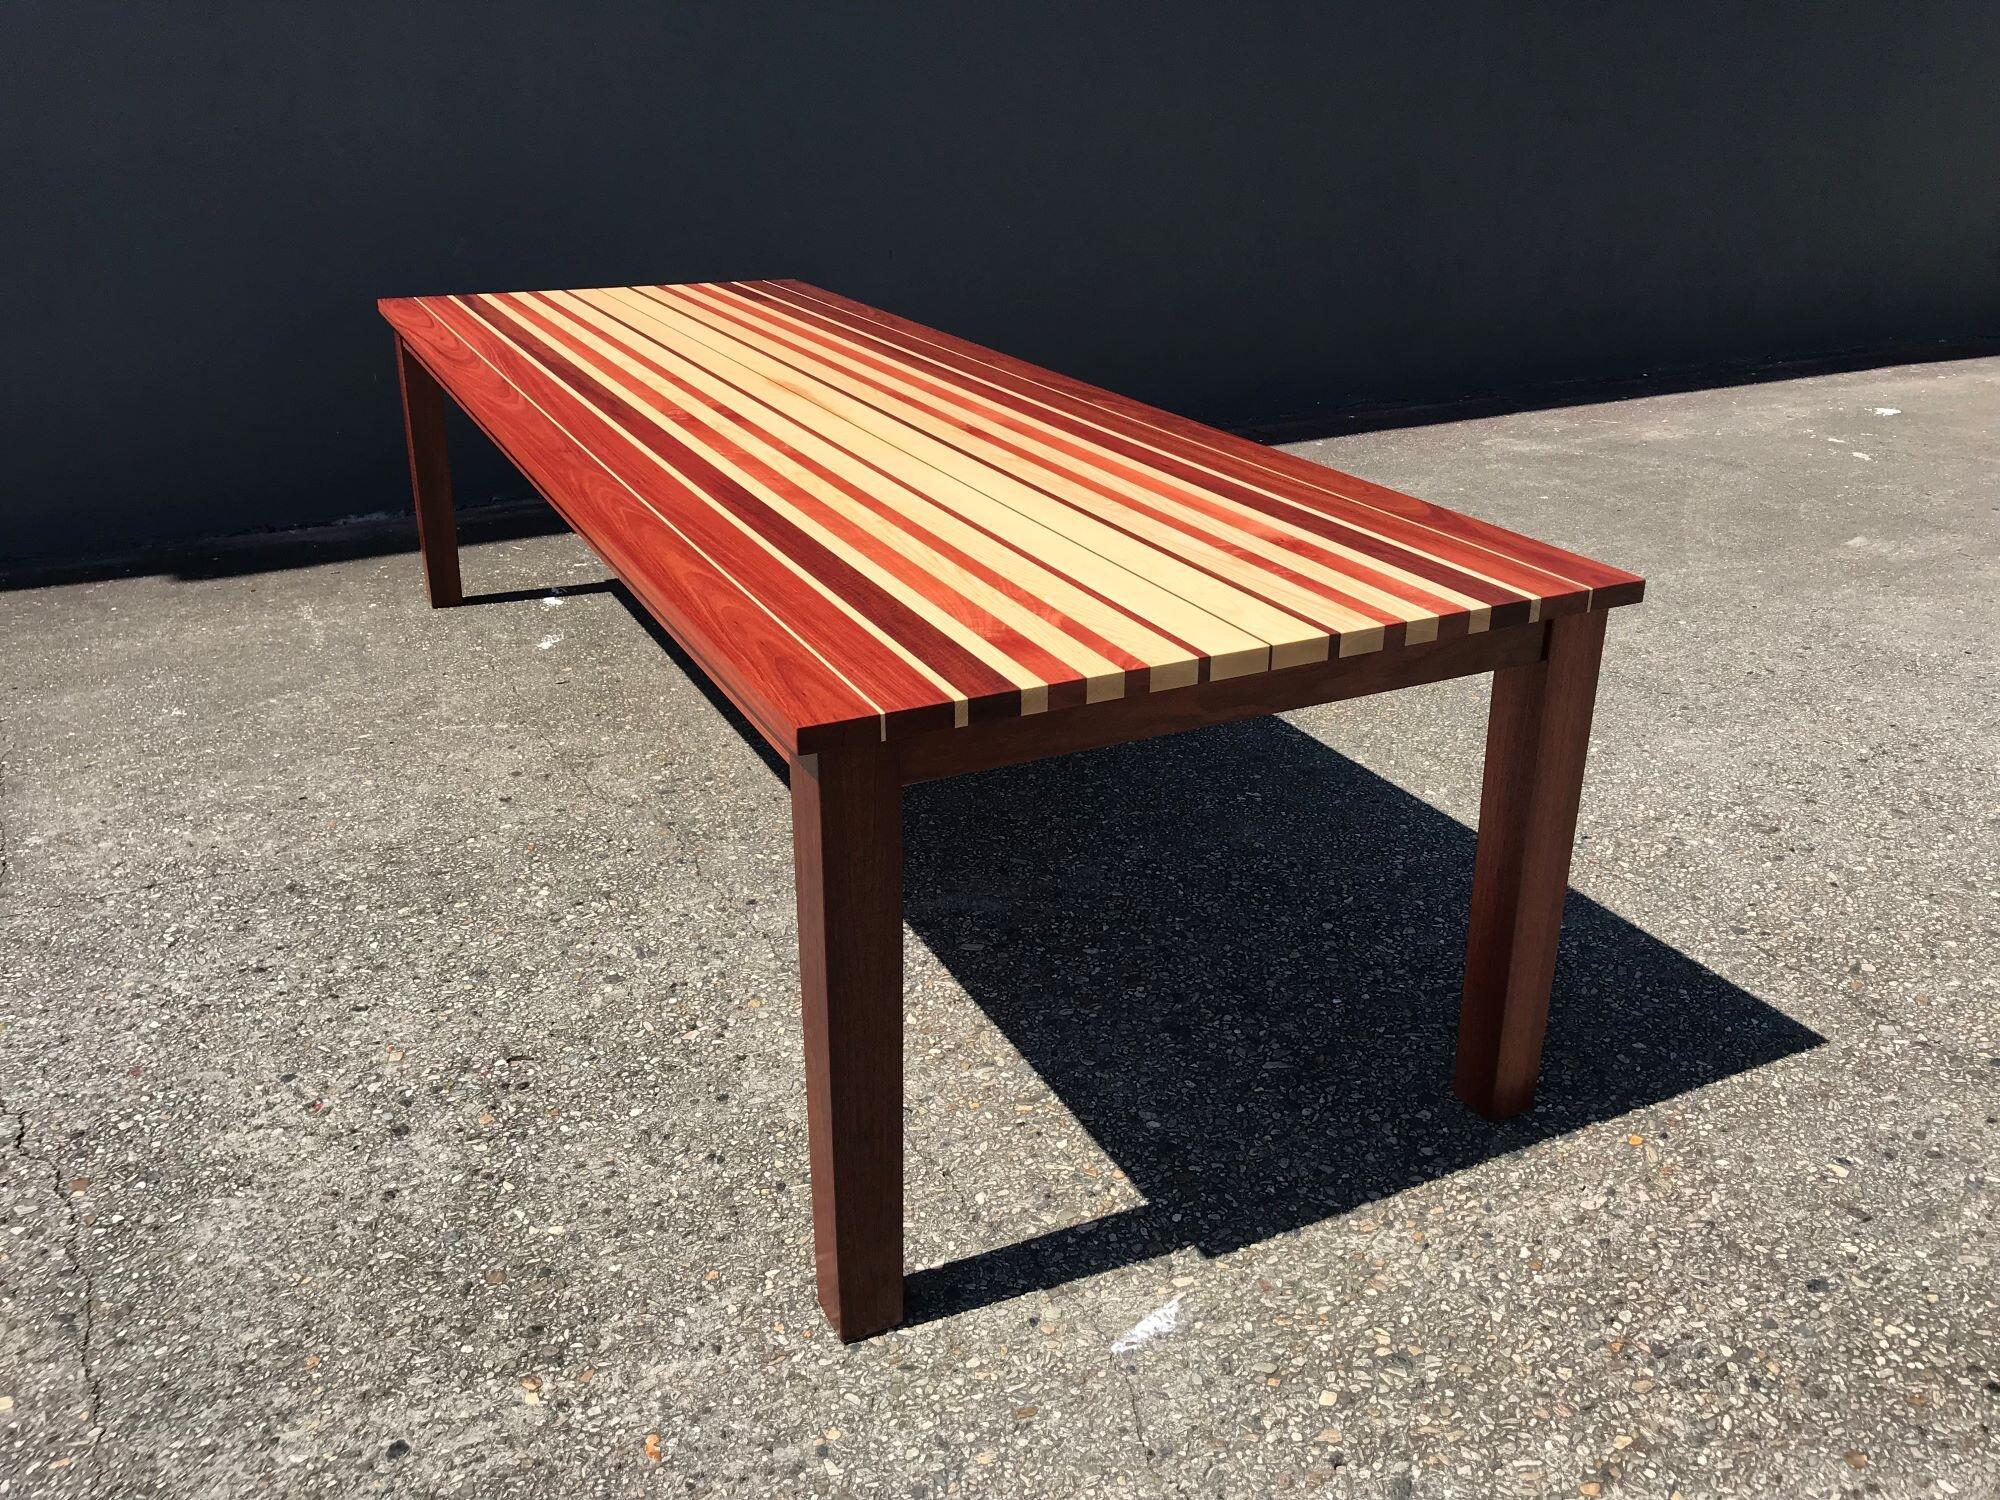 transition table bywater design brisbane.JPG